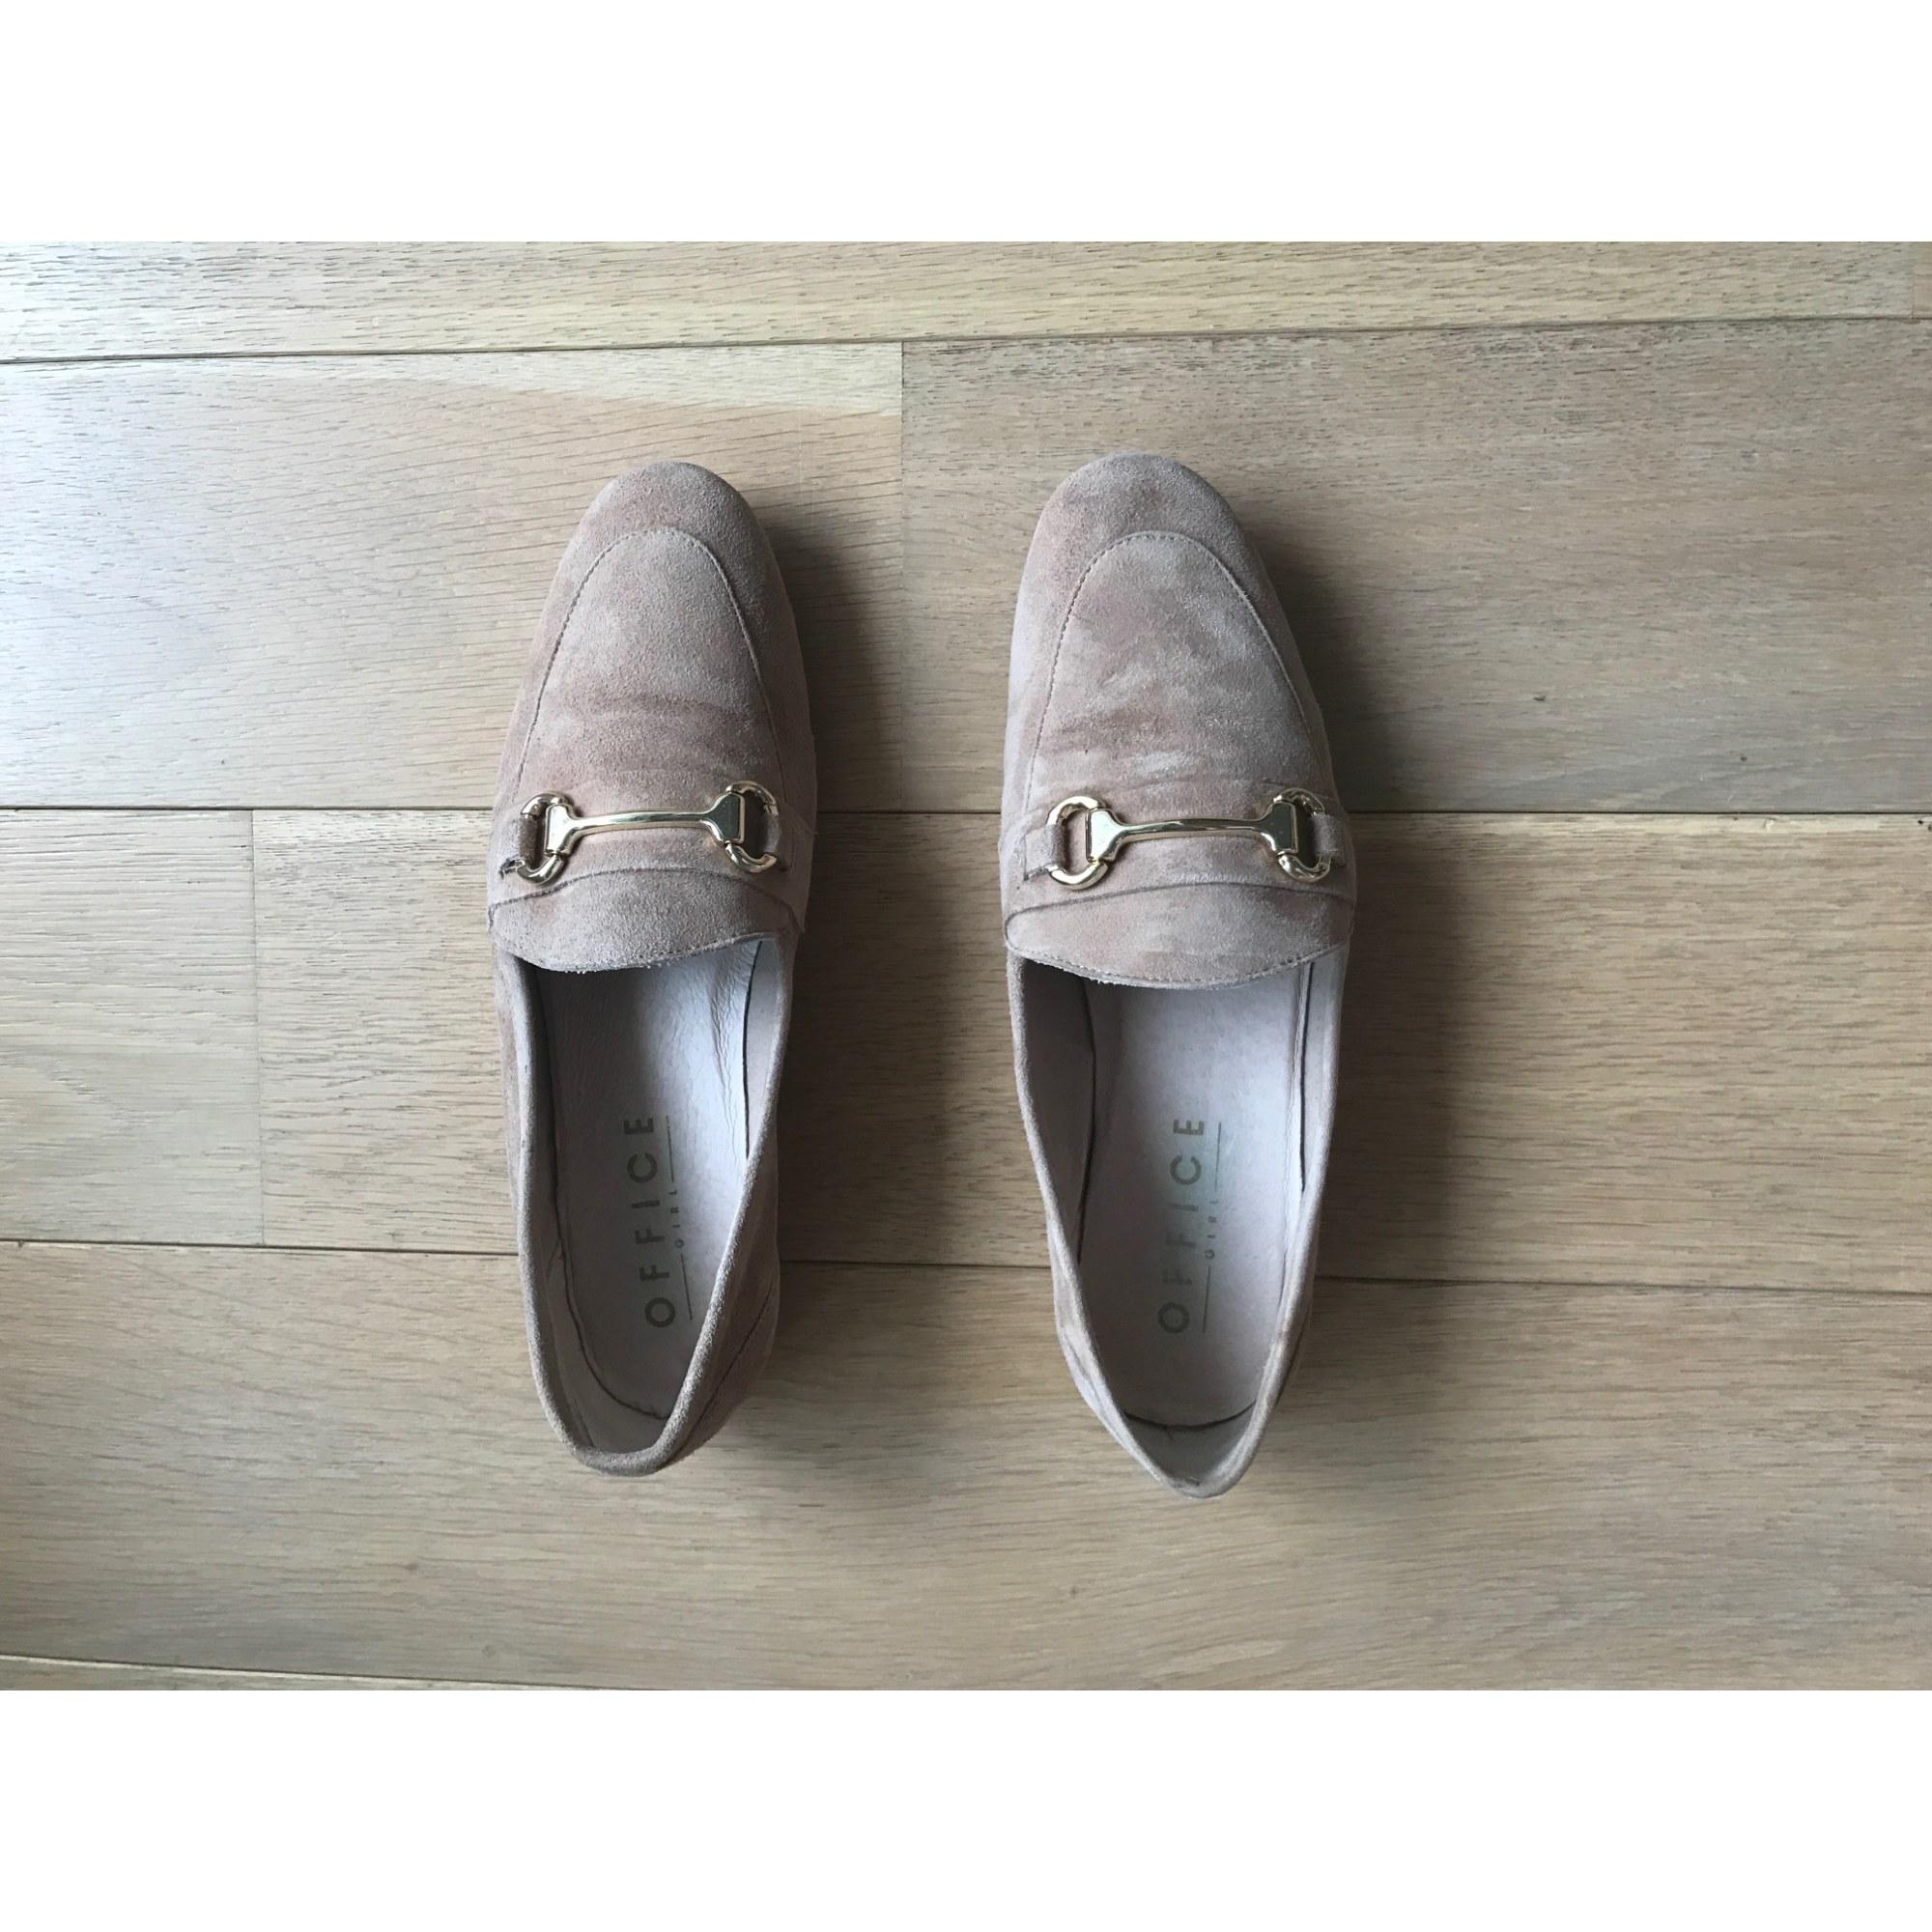 Mocassins Office Shoes London Daim Rose 37 SkSJmV2C